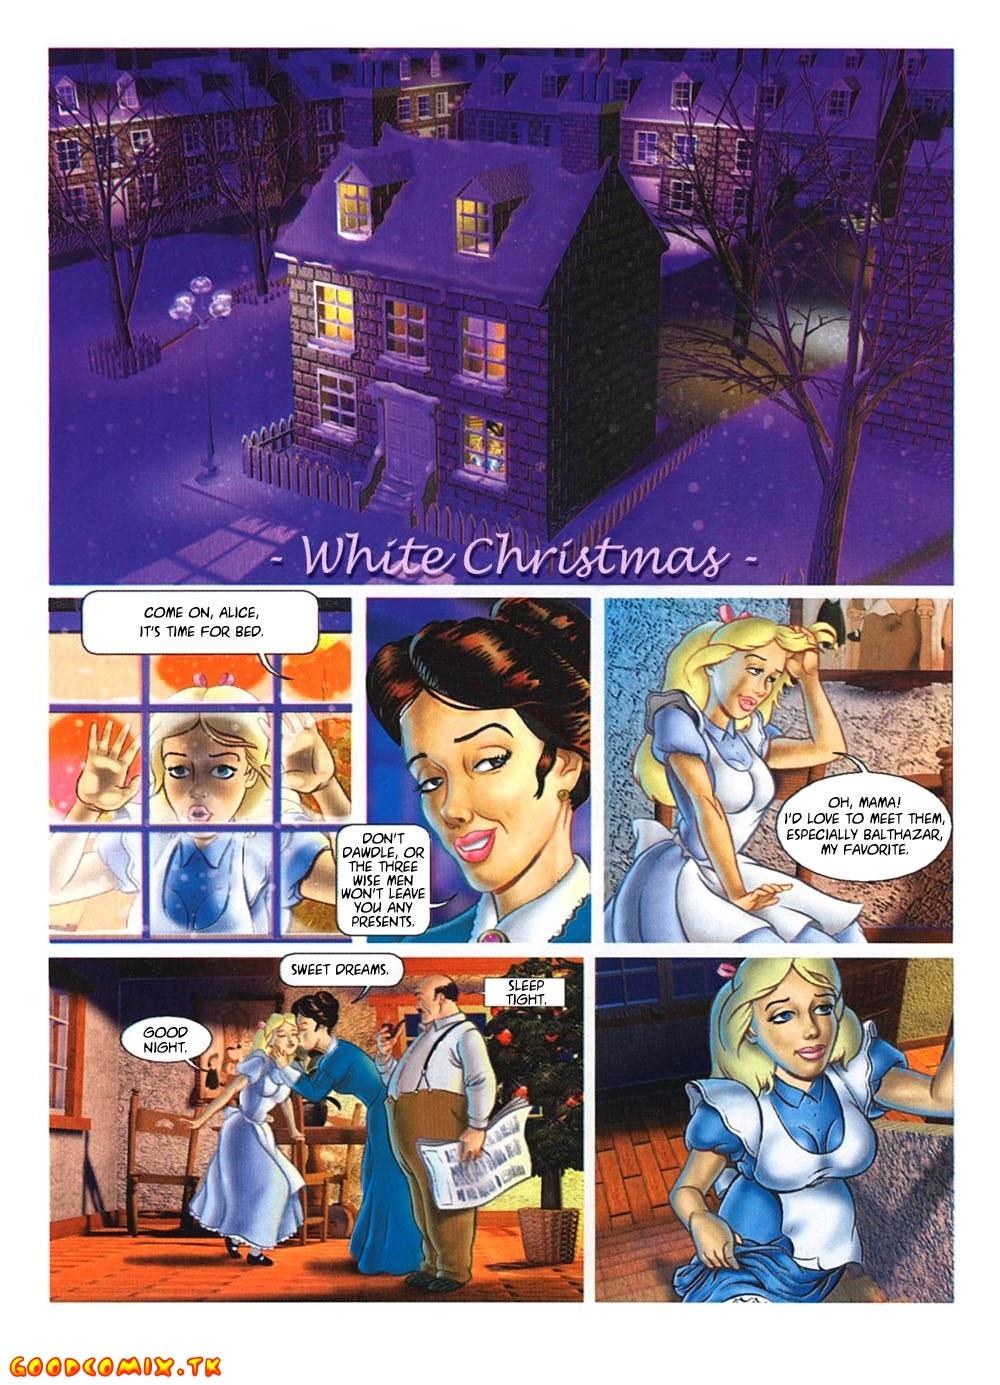 Goodcomix.tk Alice in Wonderland - [Paco Roca] - White Christmas + Cut Versions